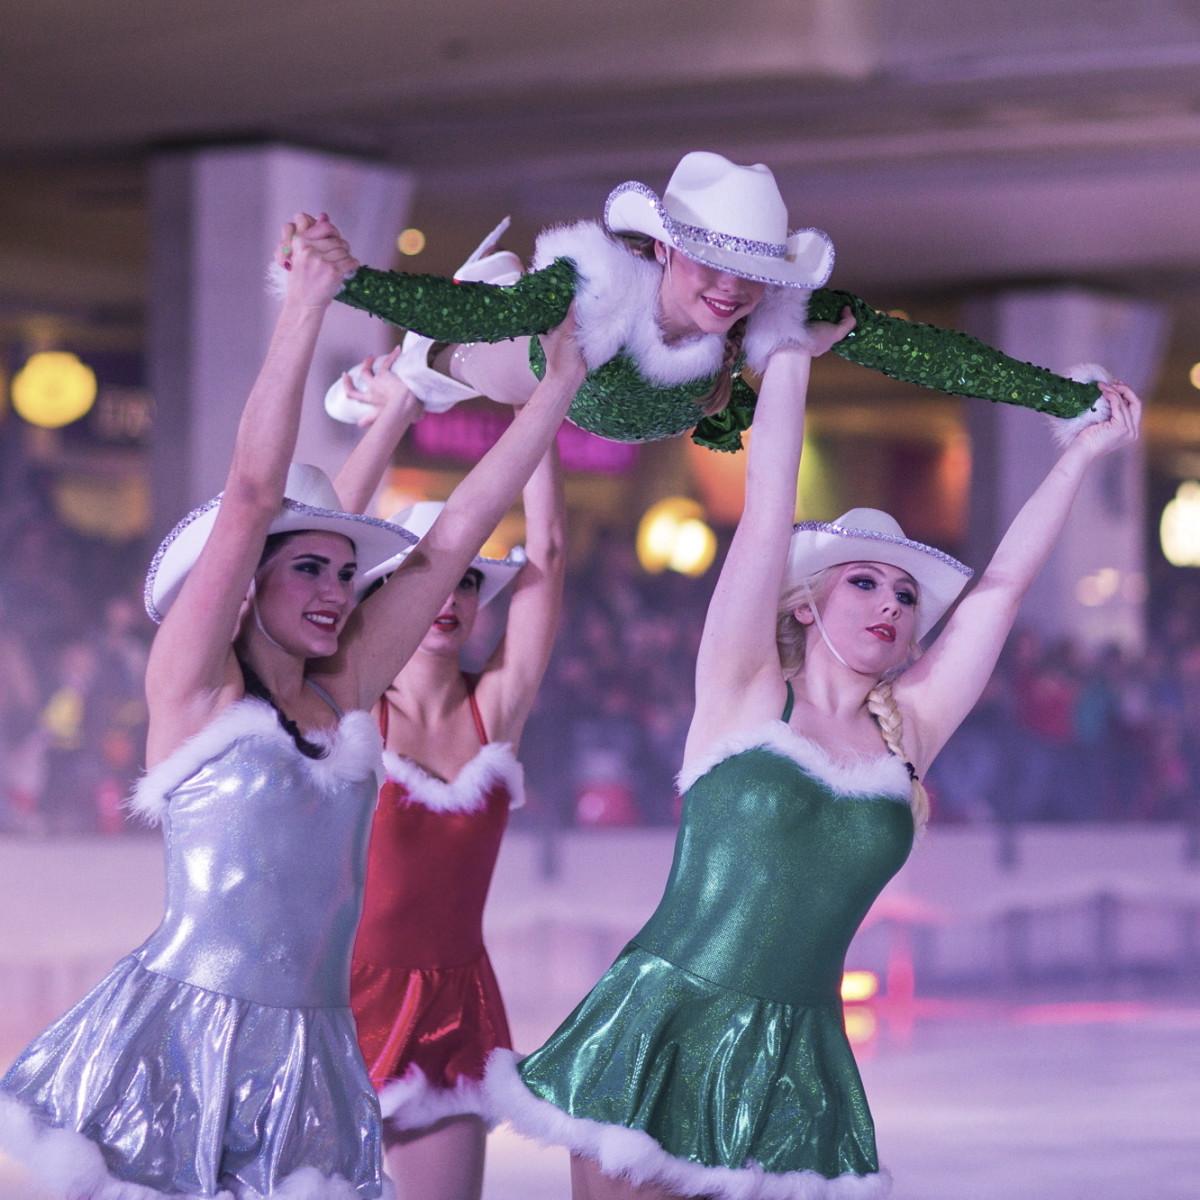 Galleria Ice Spectacular Nov 2015 skaters